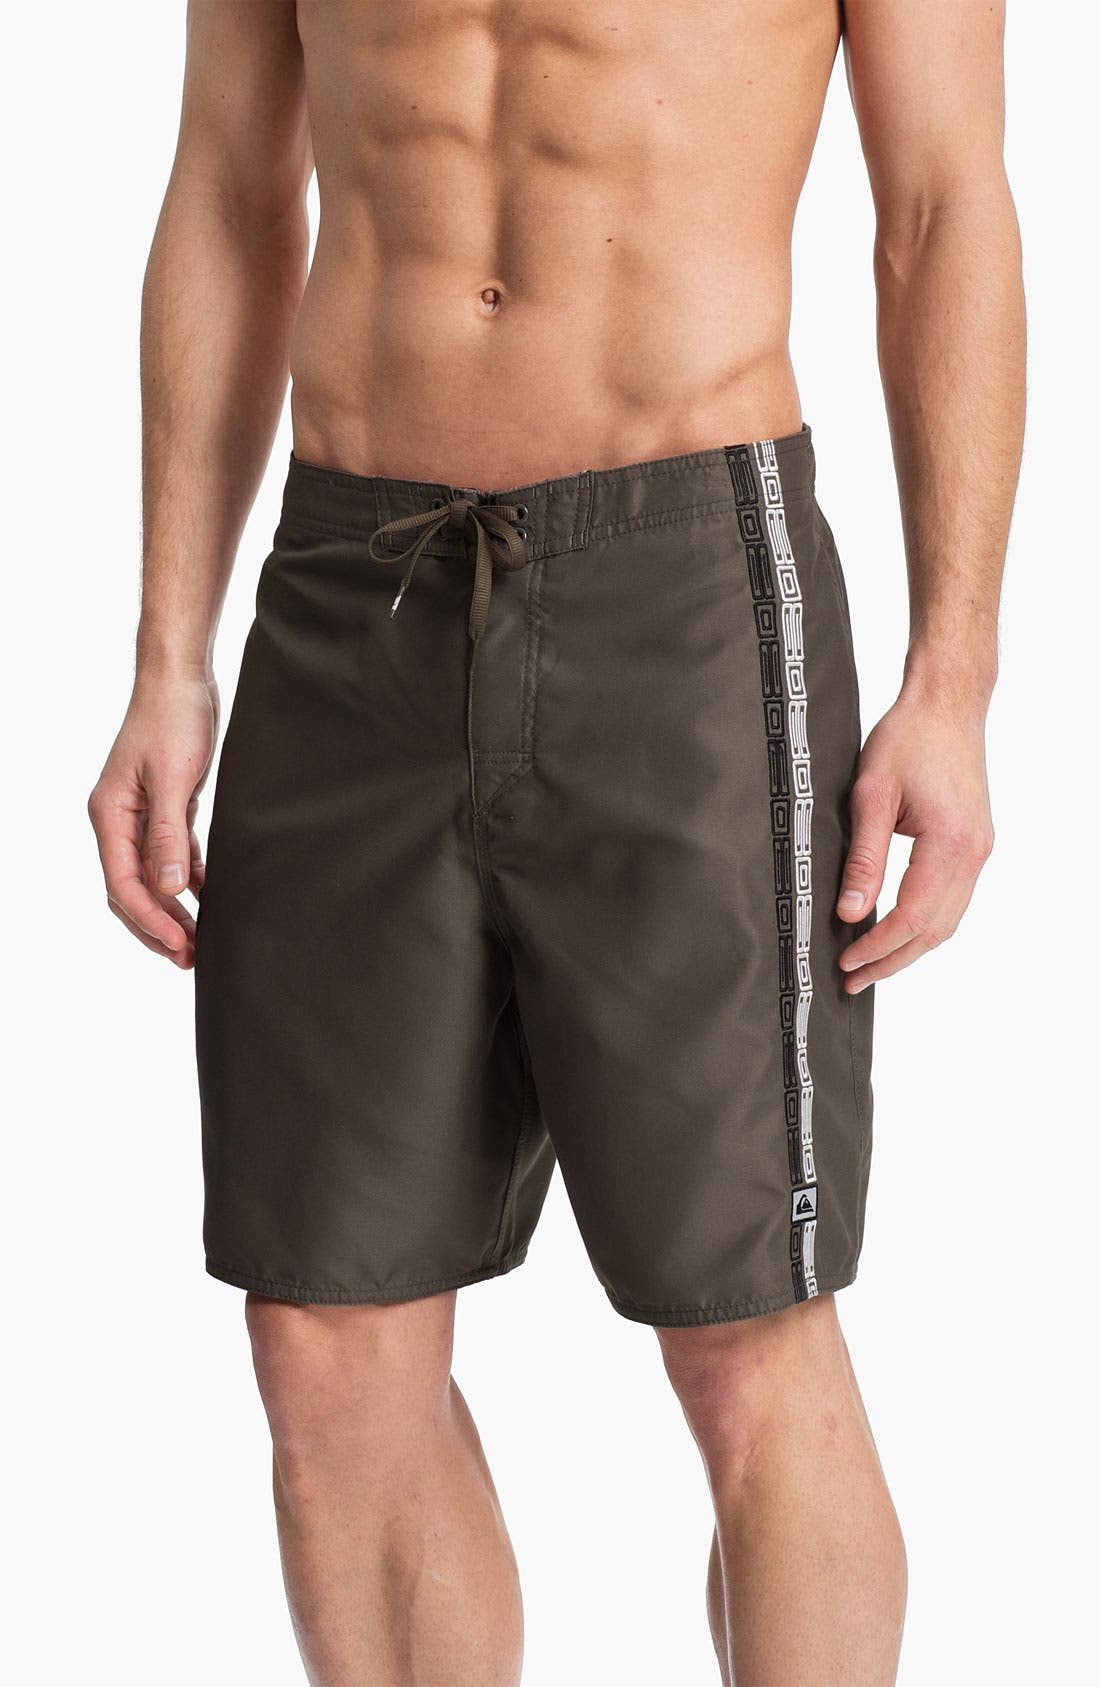 Main Image - Quiksilver 'Balboa' Board Shorts